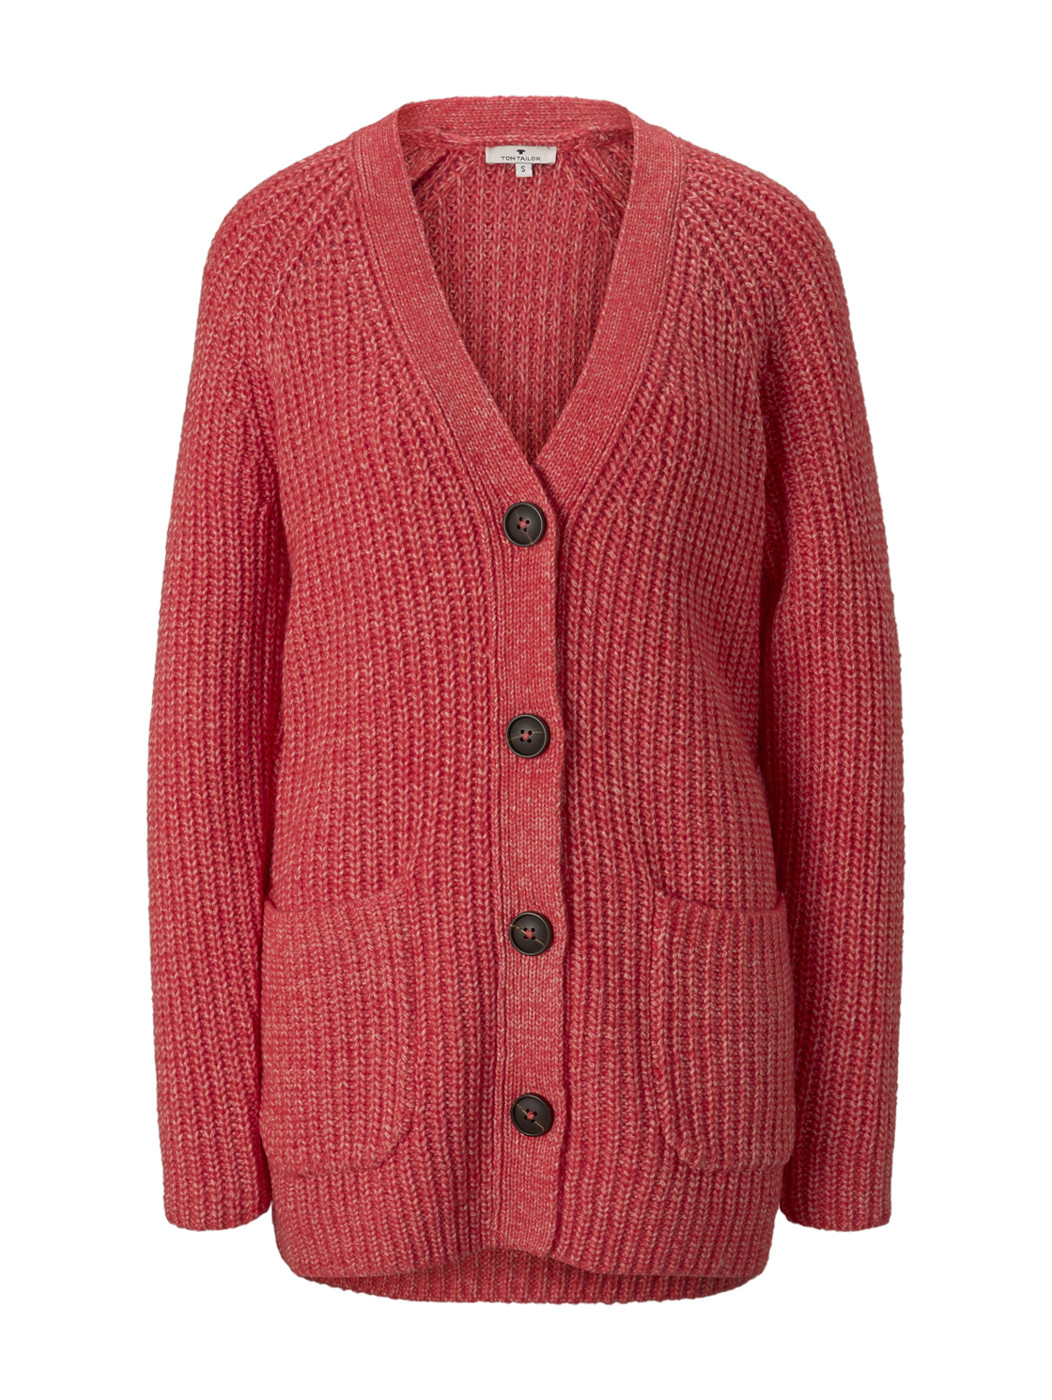 cardigan in mouline yarn - Damen